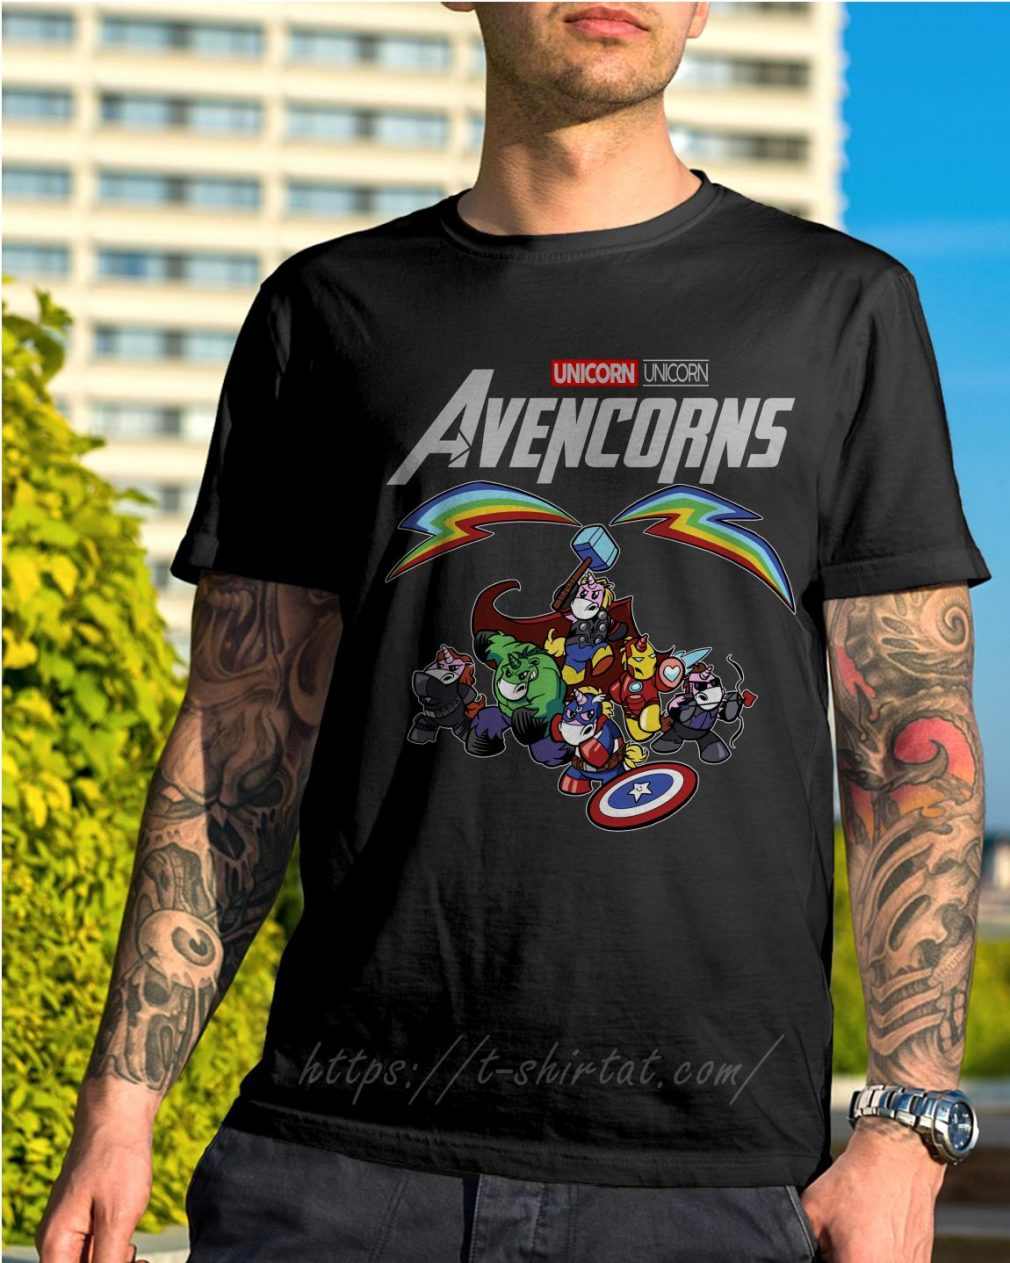 Marvel Unicorn Avencorns shirt